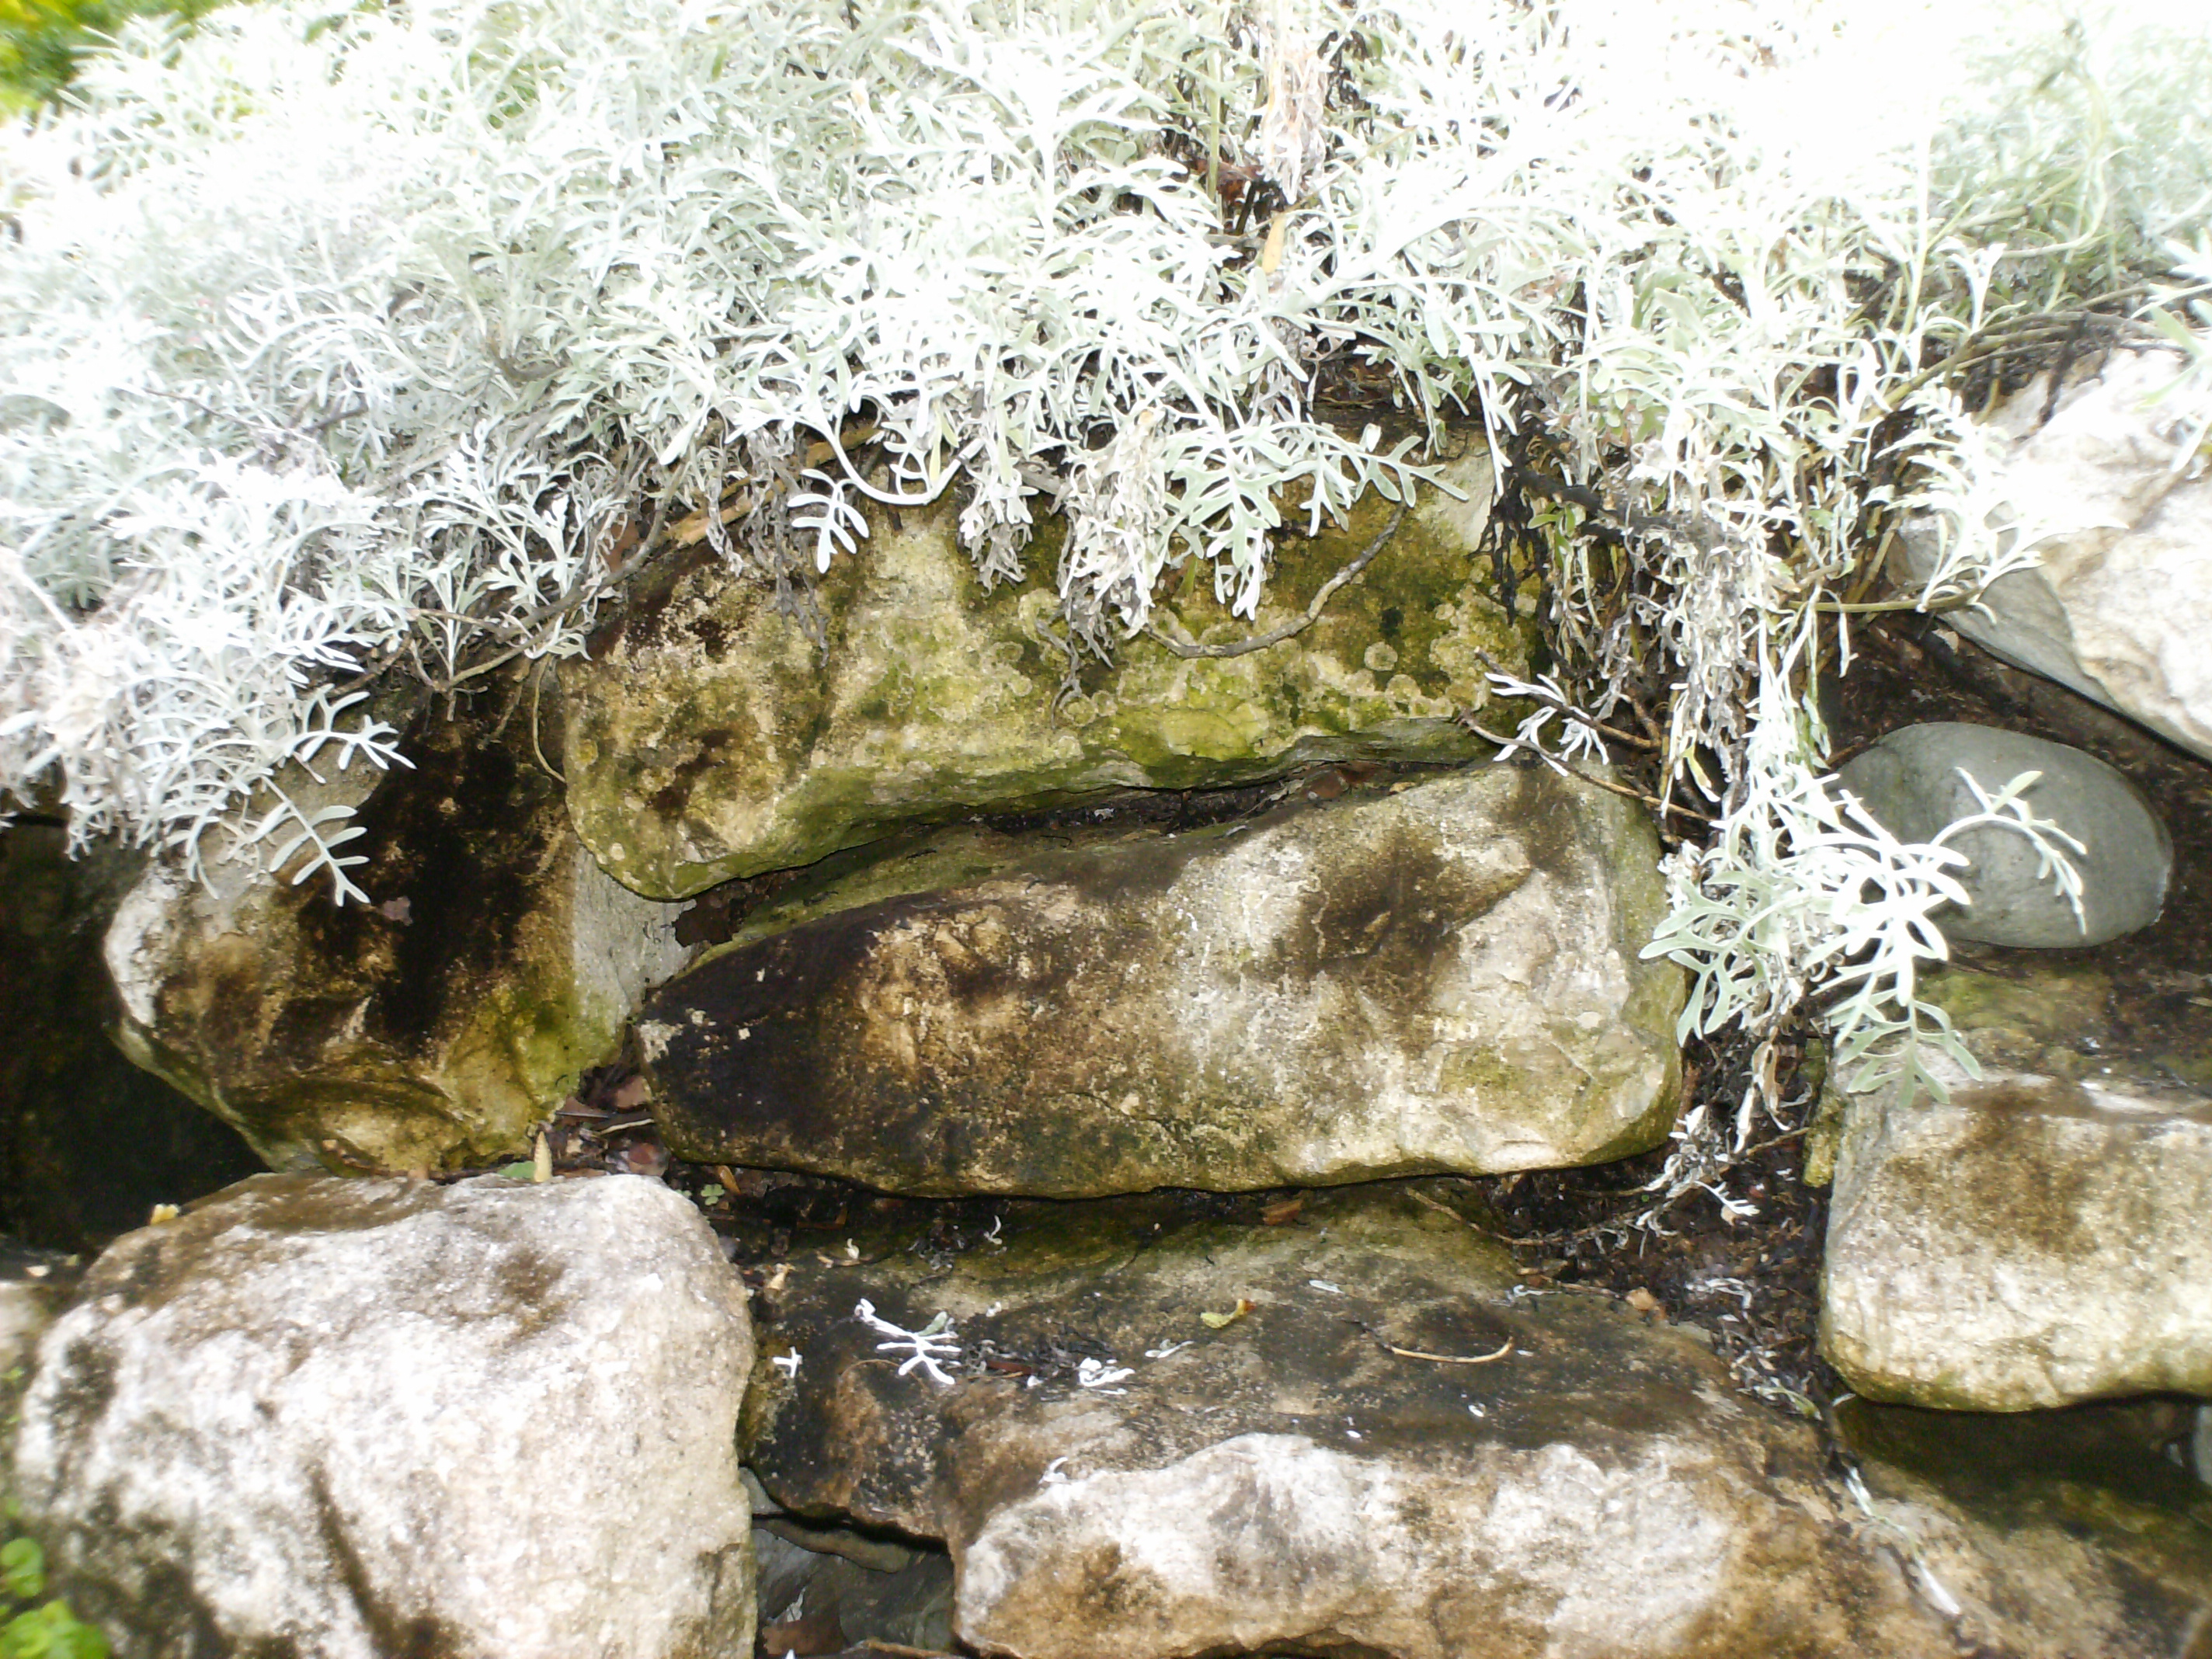 Rocks, Moss, Plants, Stone, Texture, HQ Photo